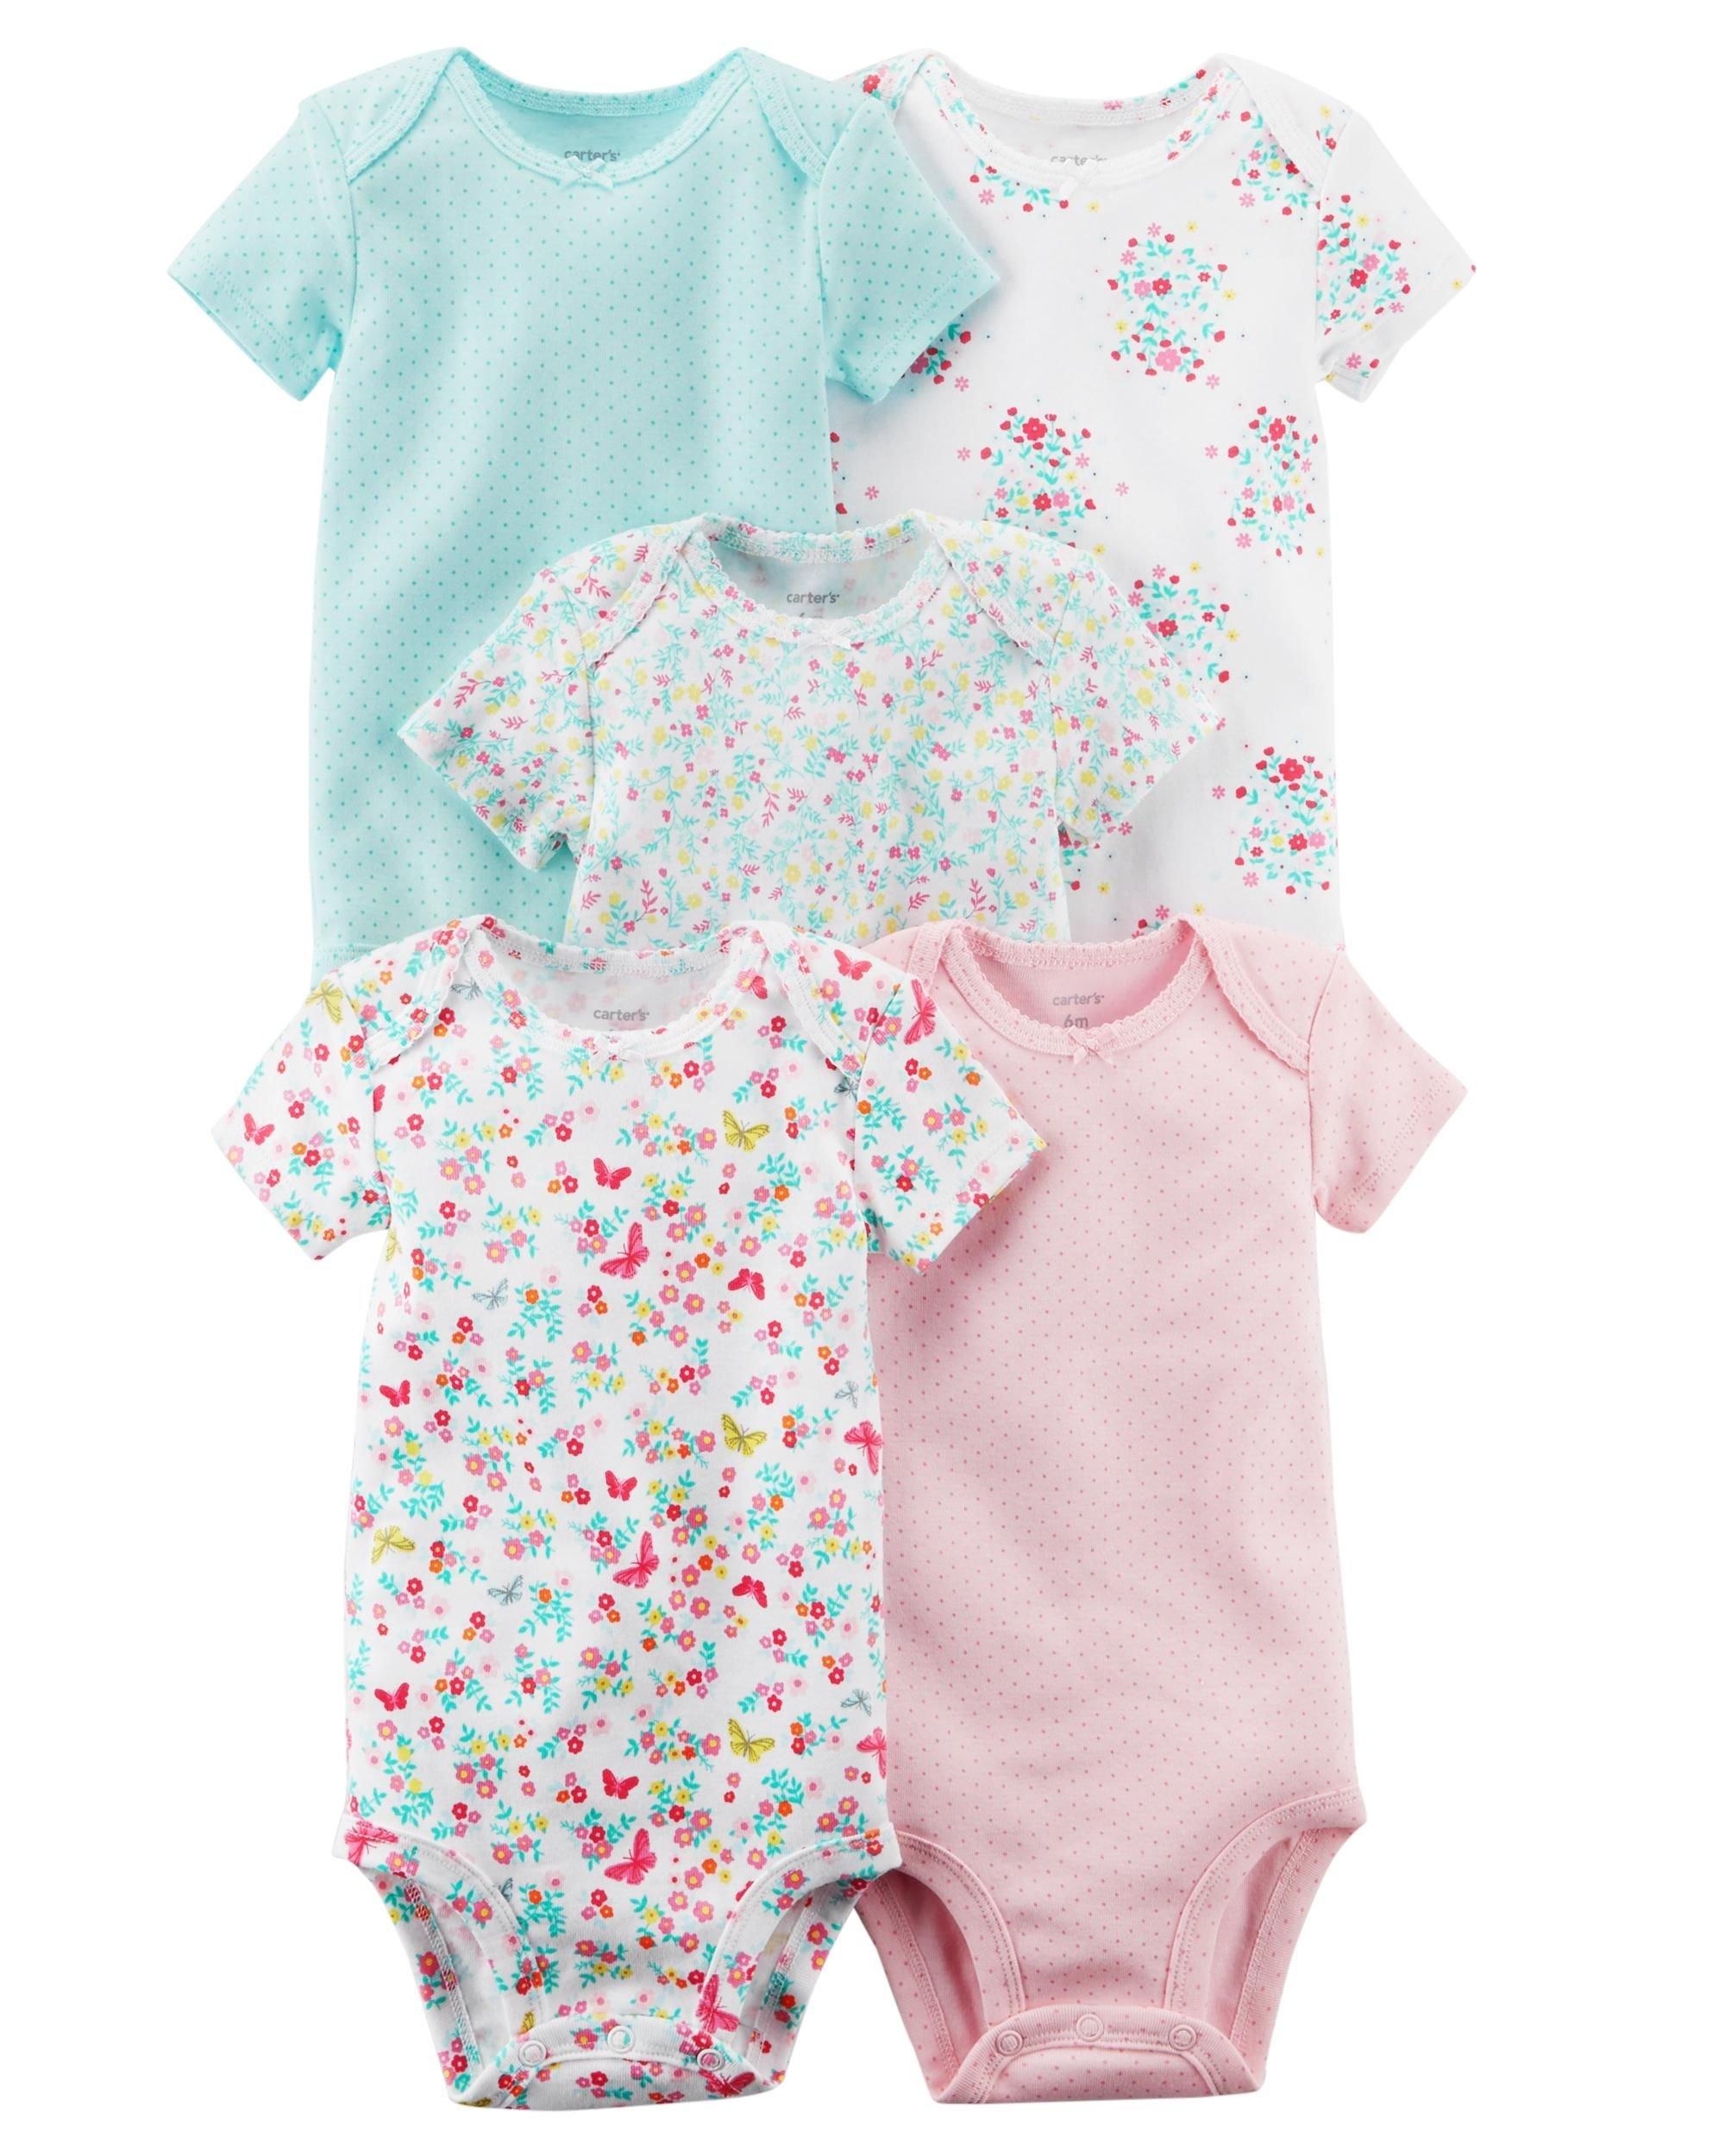 e76457b2c Galleon - Carter's Baby Girls 5 Pack Bodysuit Set, Flowers, 9 Months